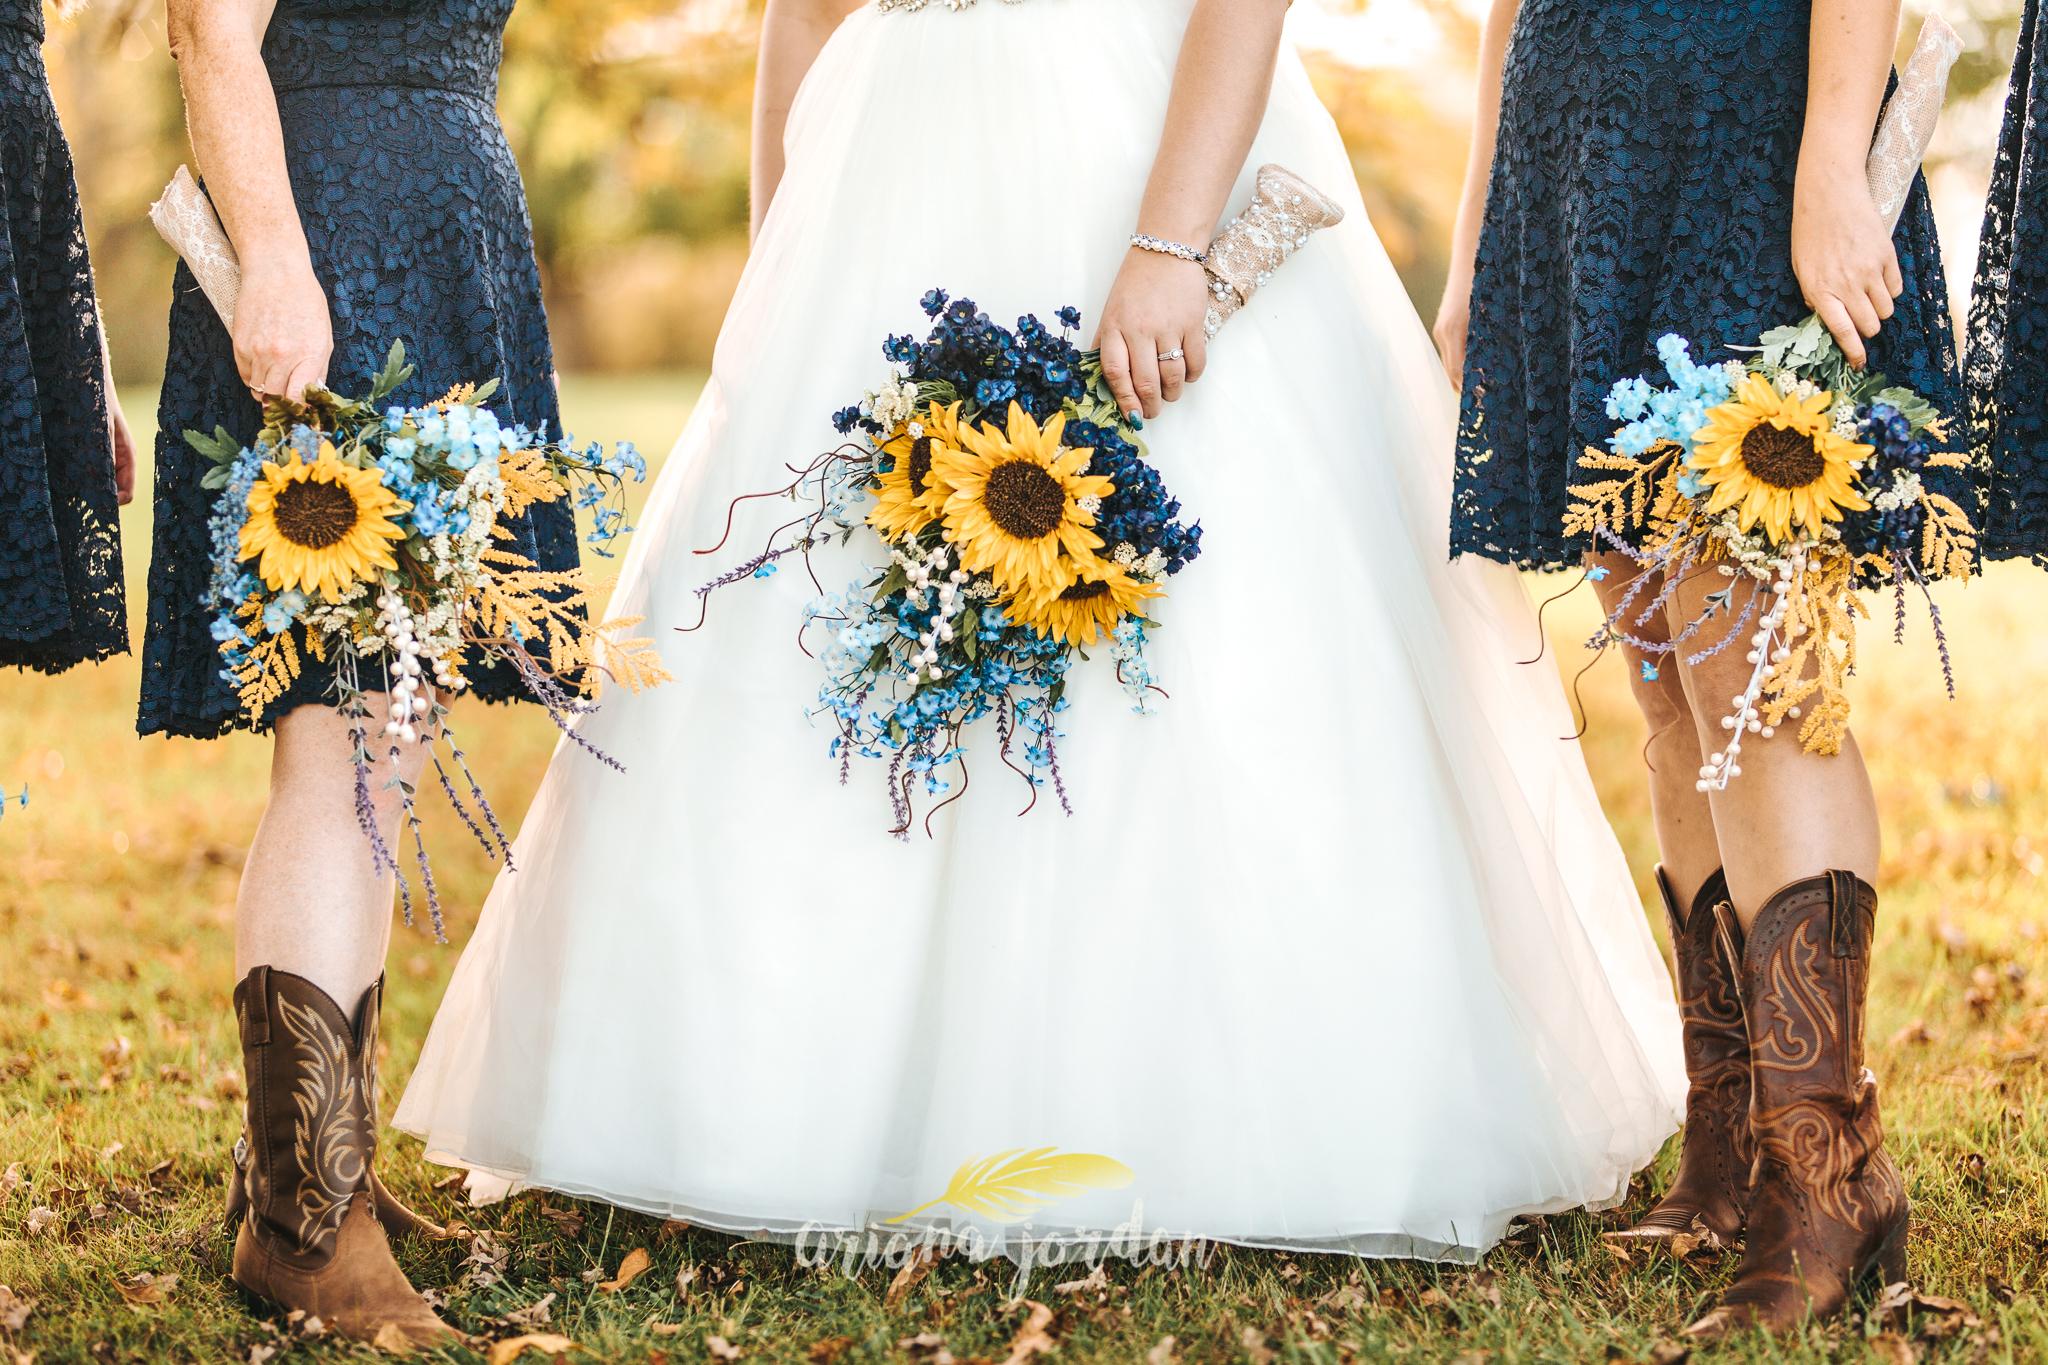 0066 Ariana Jordan Photography - Georgetown KY Wedding Photographer 6761.jpg